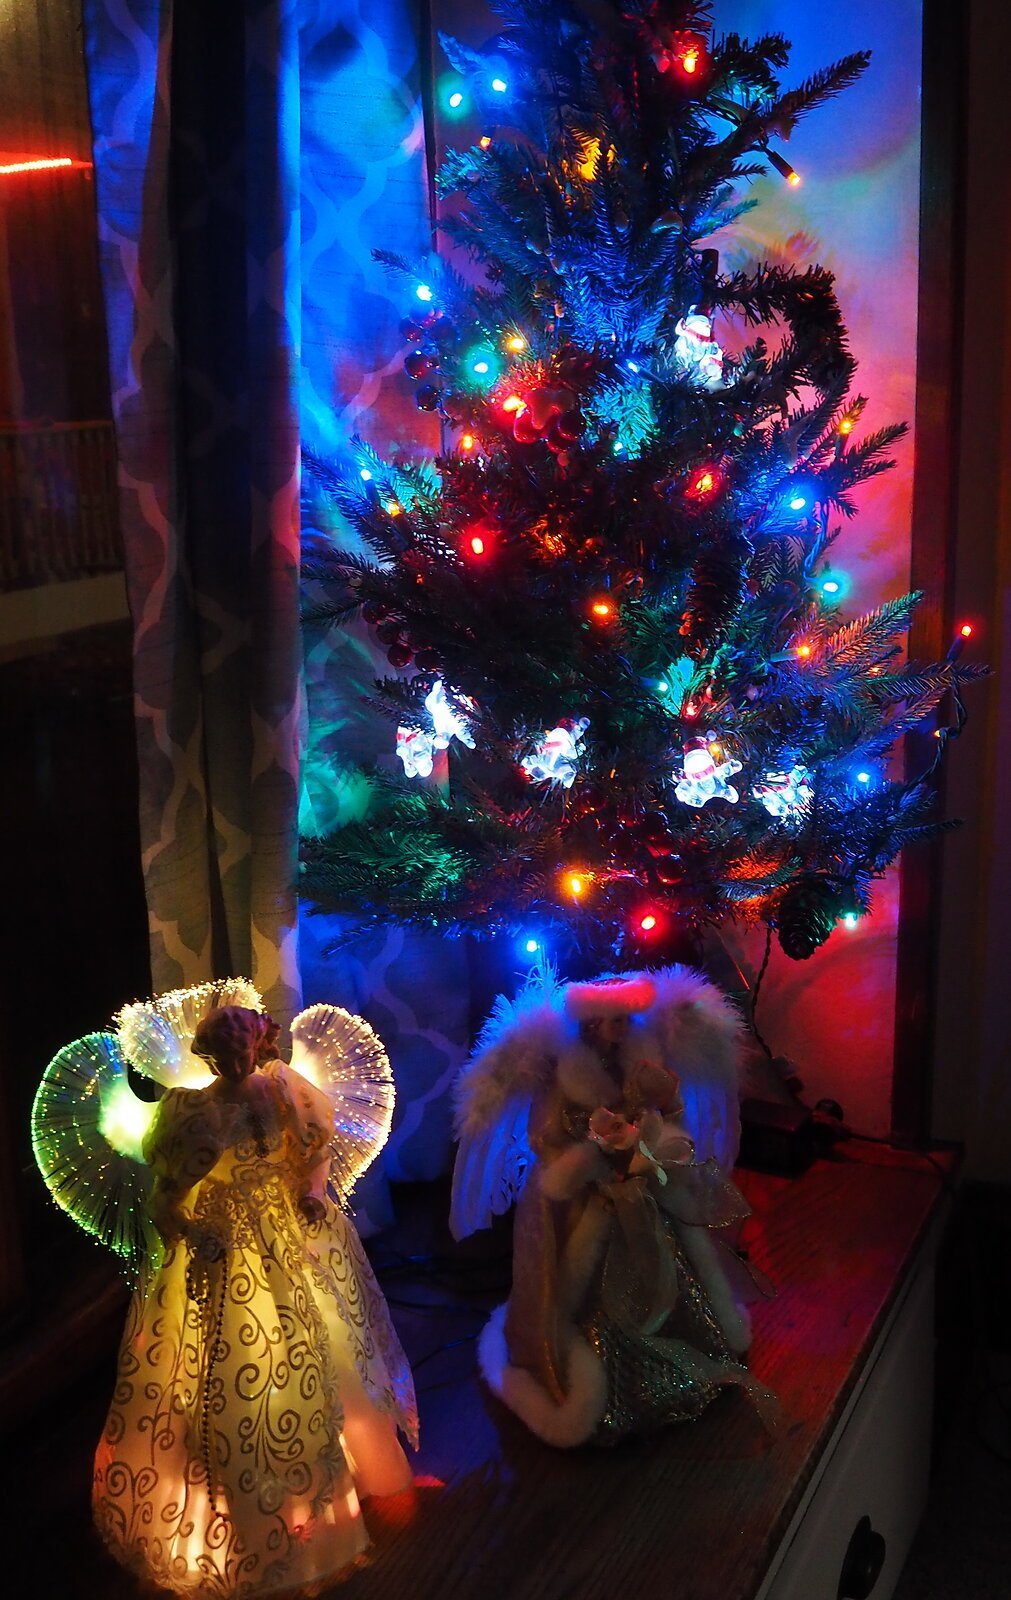 M1 sunset rt 20 Christmas decorations 011-001.JPG